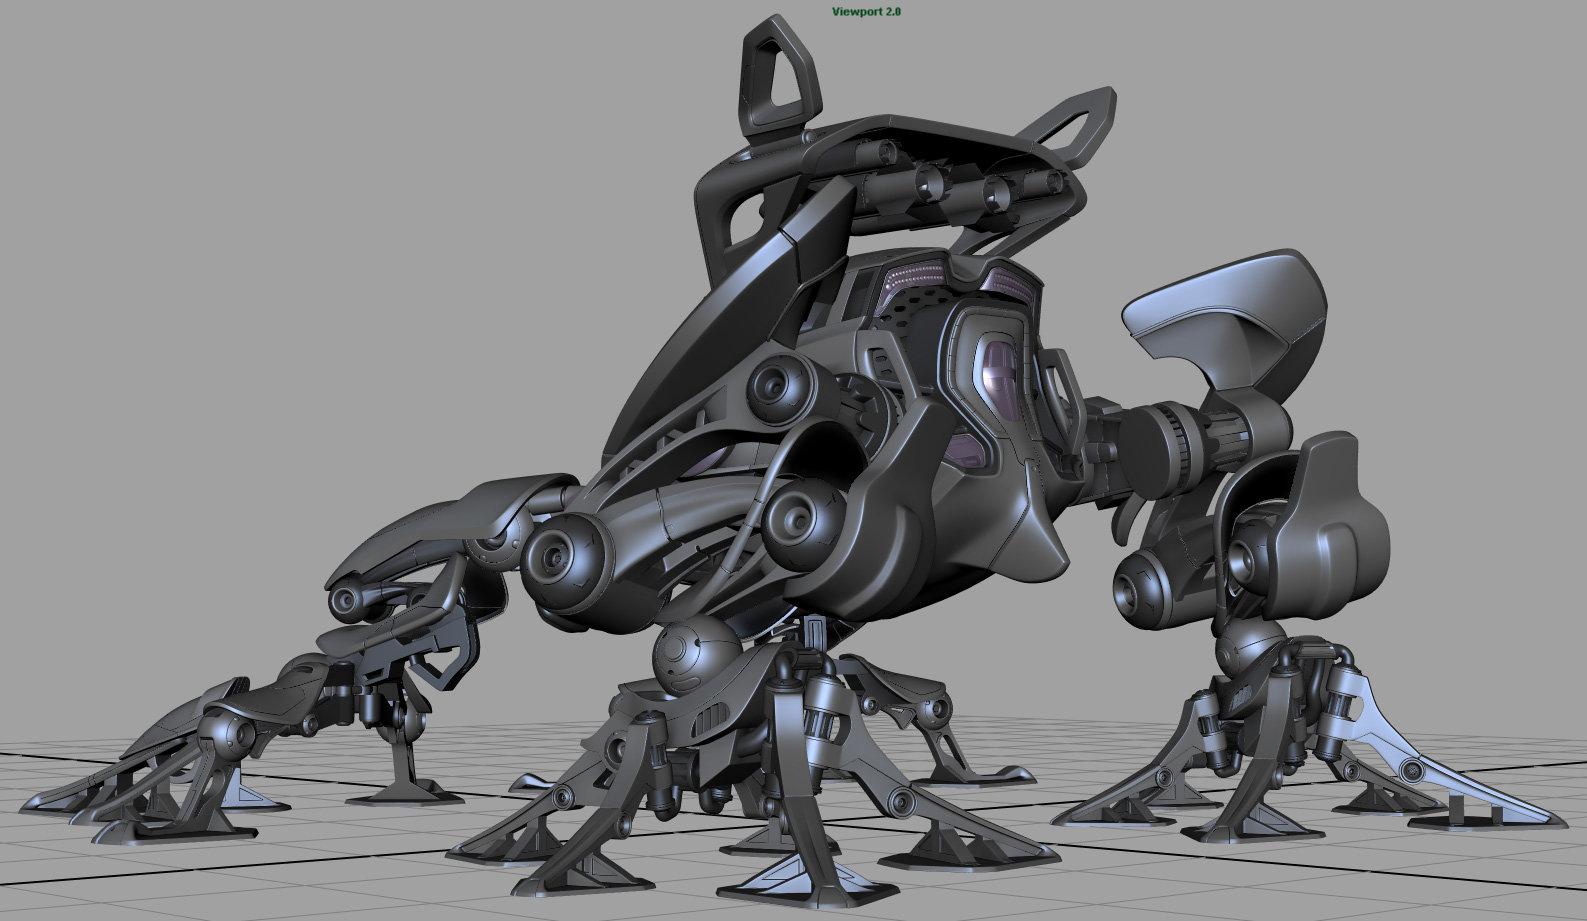 David letondor david letondor robot frog v14